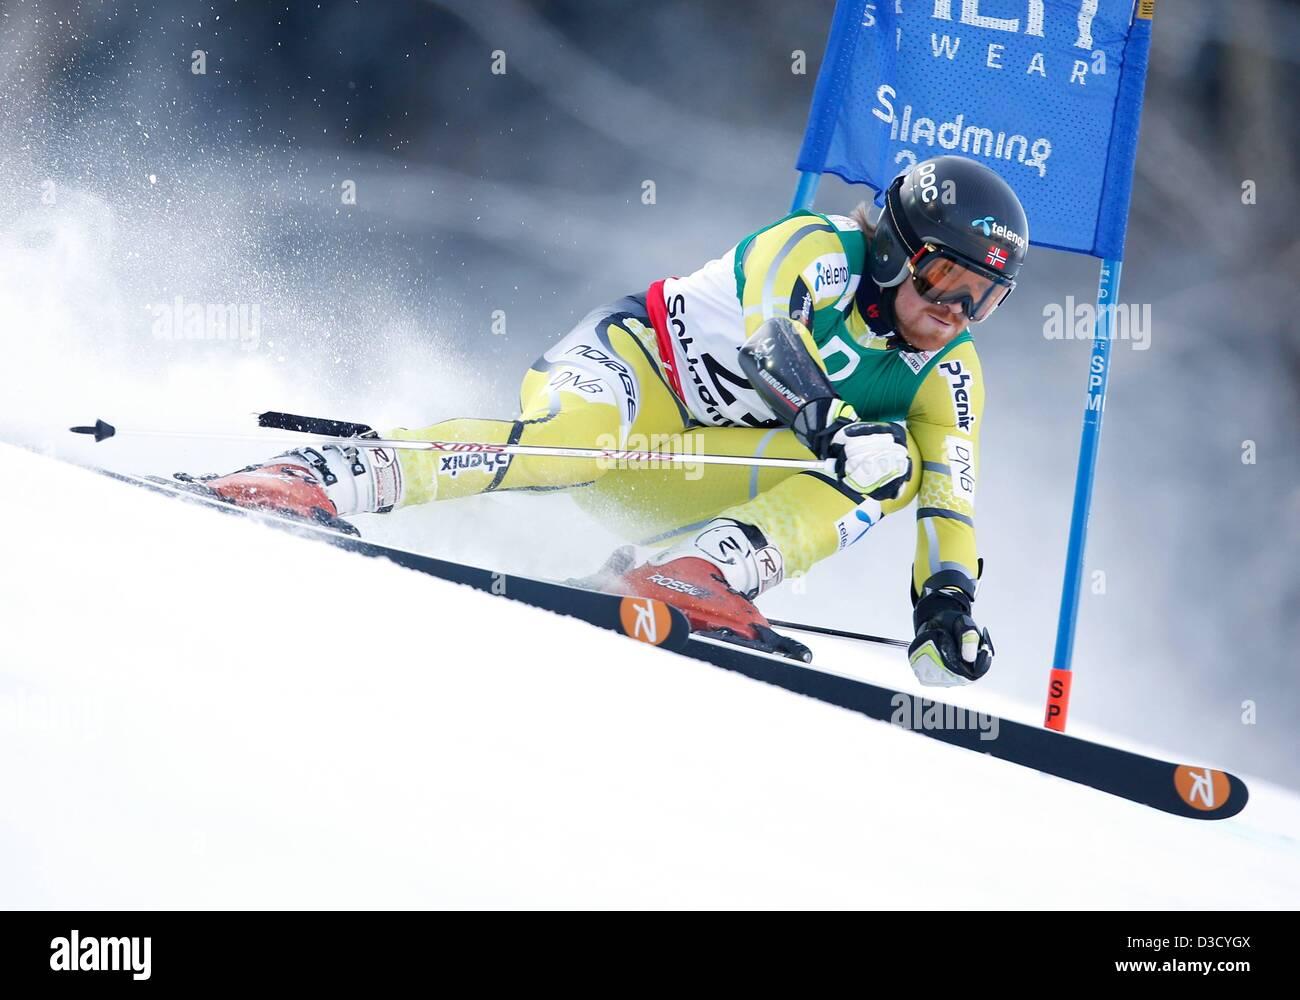 15.02.2013. Schladming, Austria. FIS Alpine Ski World Championships 2013 Giant slalom for men Picture shows Leif Stock Photo